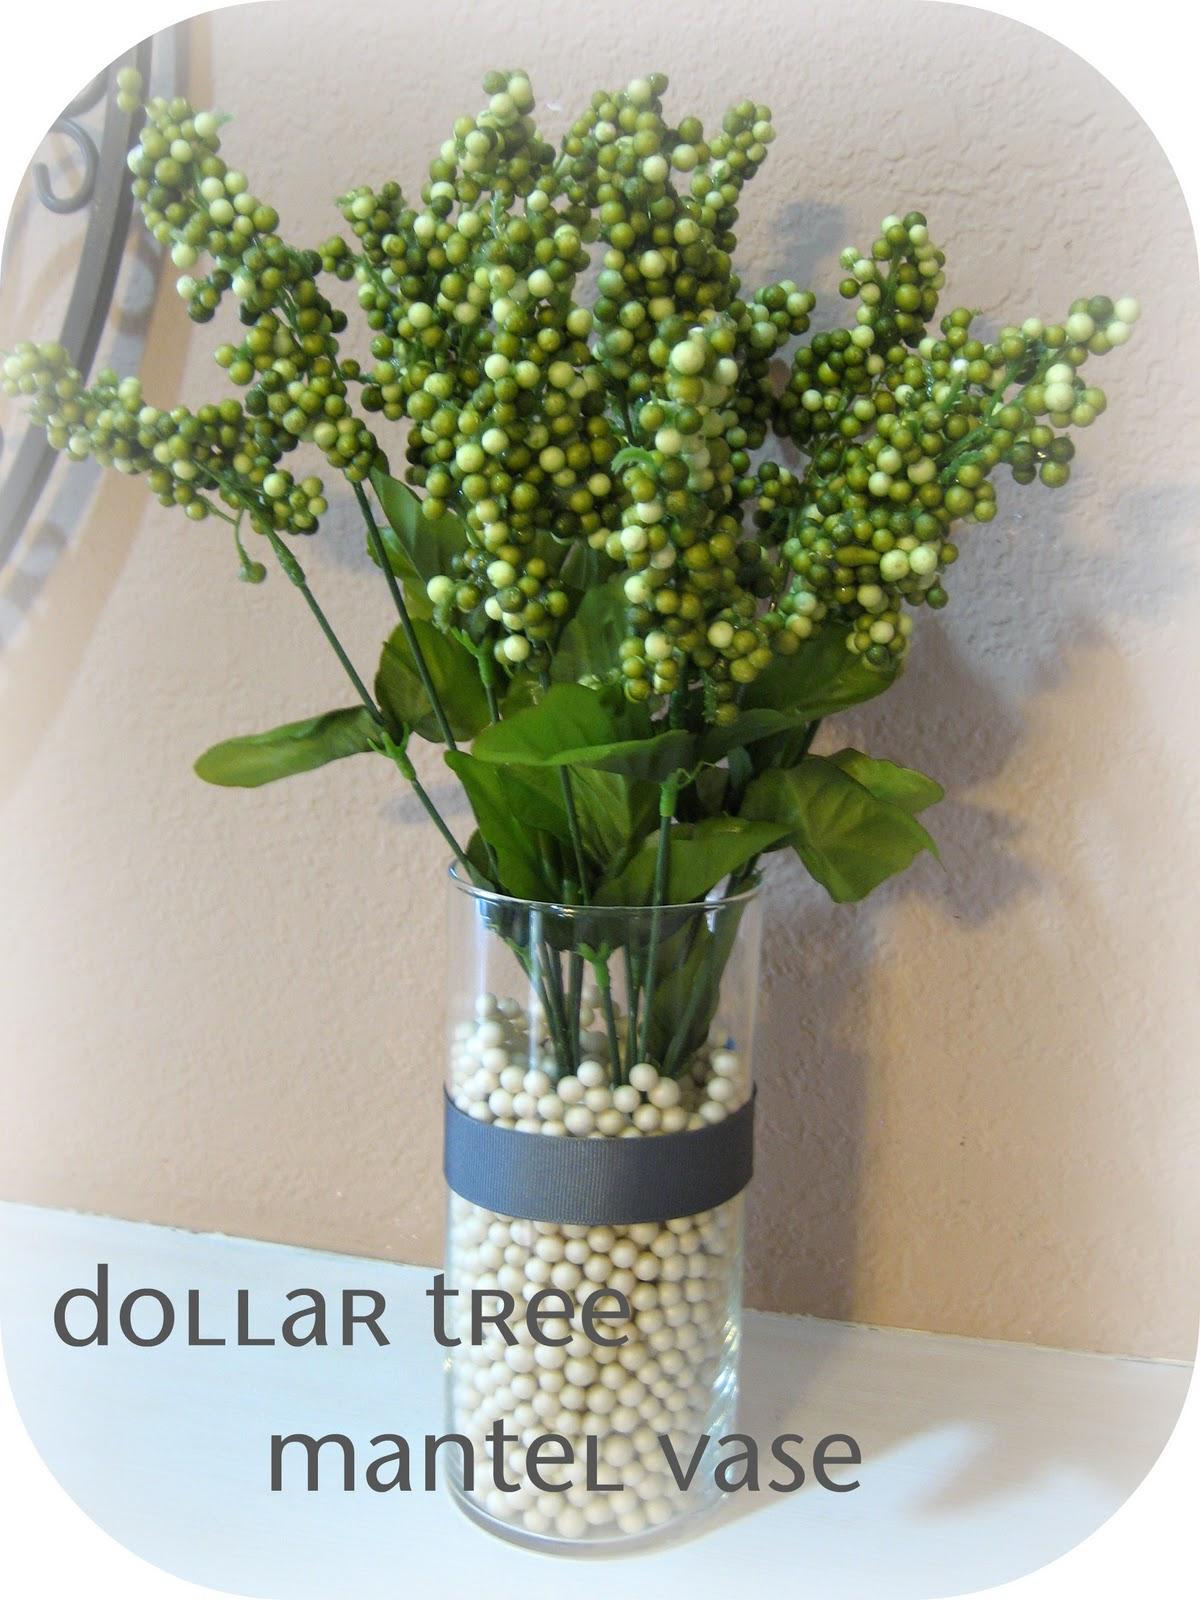 Peppermint plum dollar tree mantel vases dollar tree mantel vases reviewsmspy